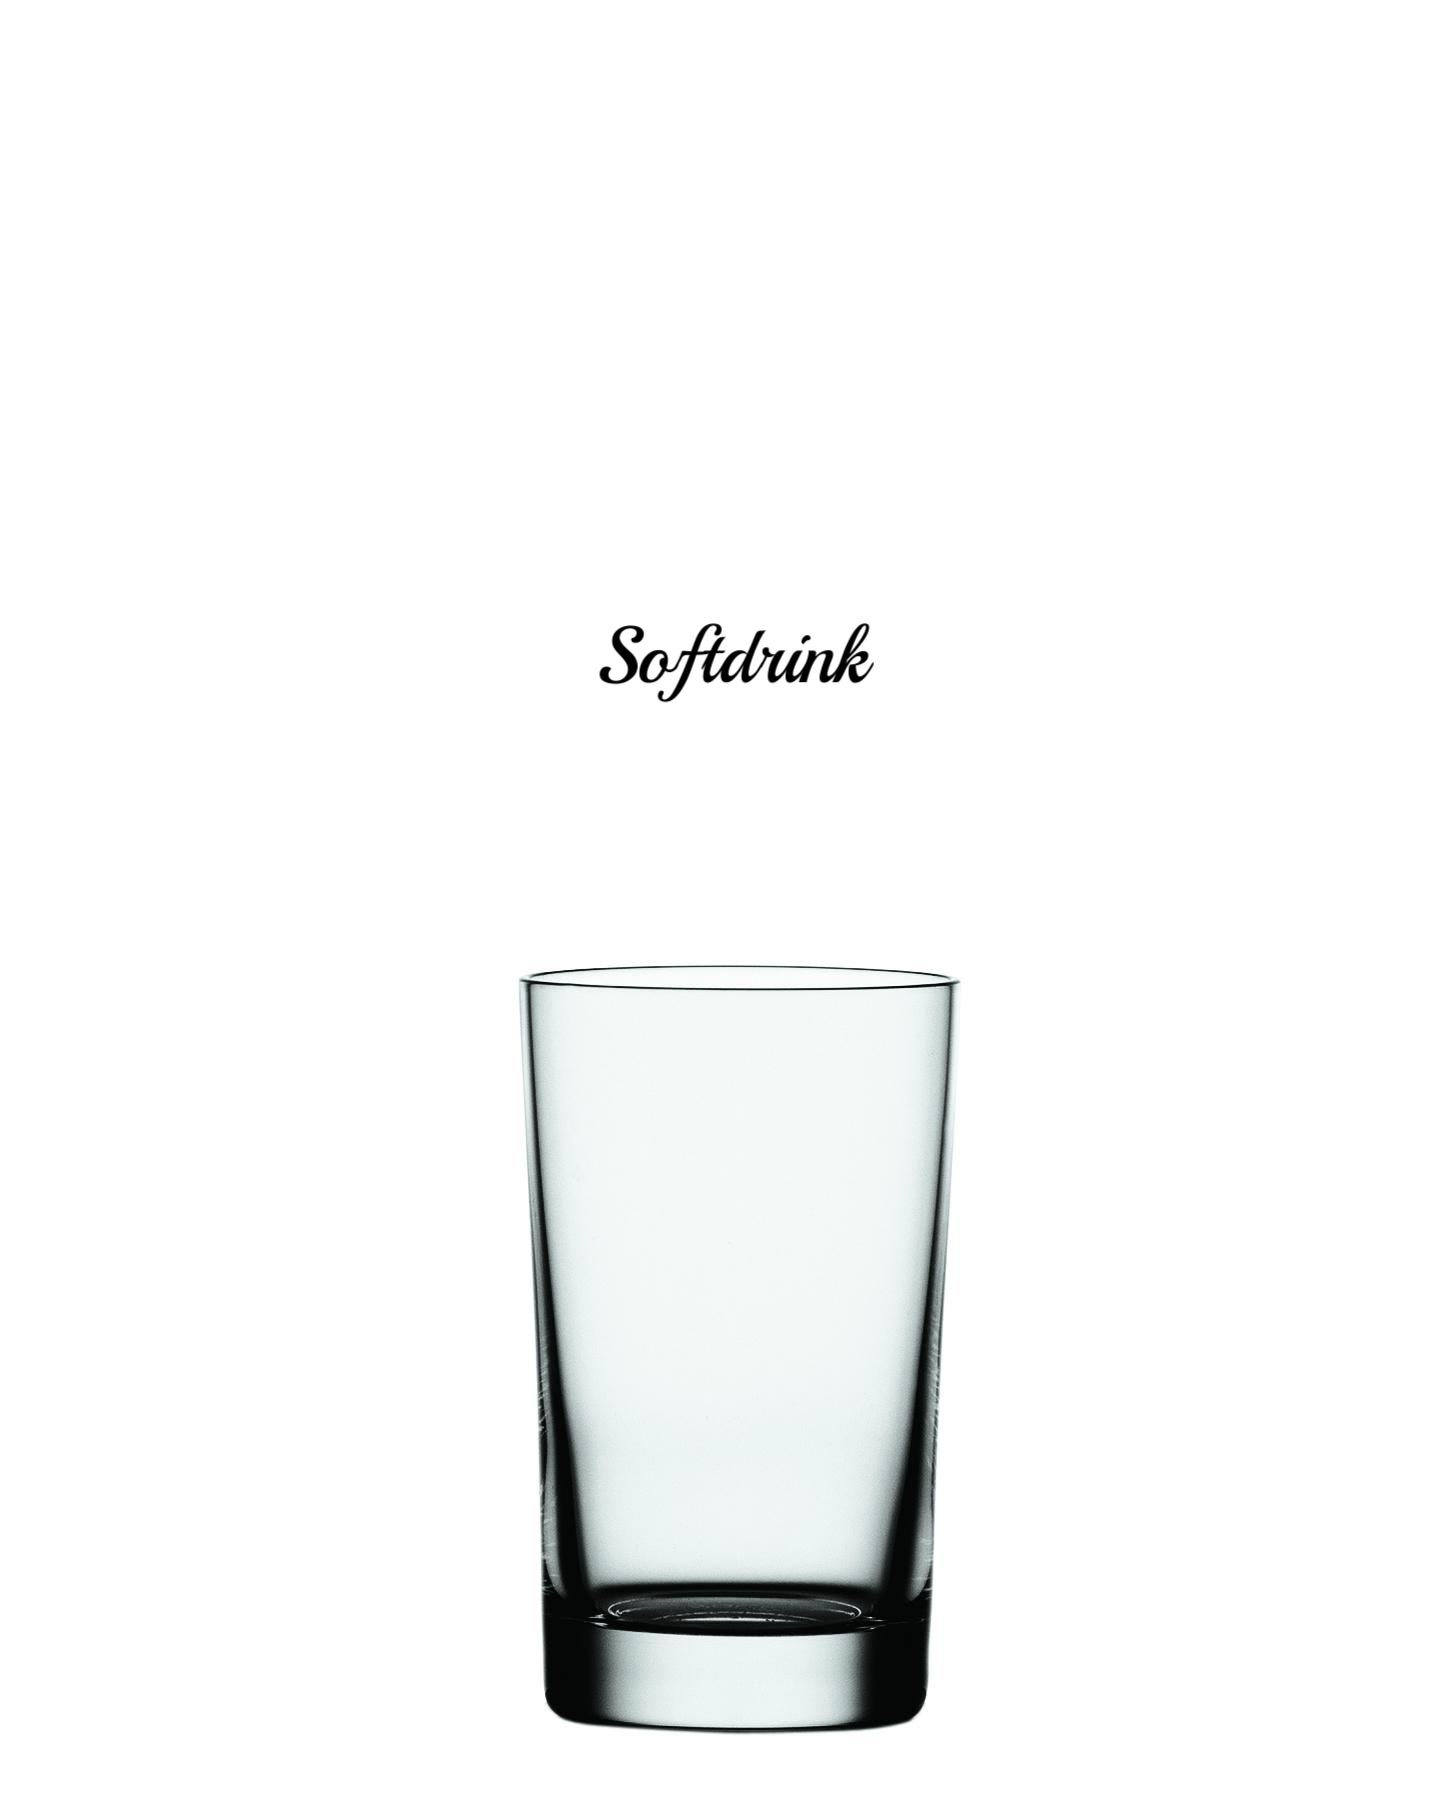 Classic Bar Softdrink 9008014.jpg